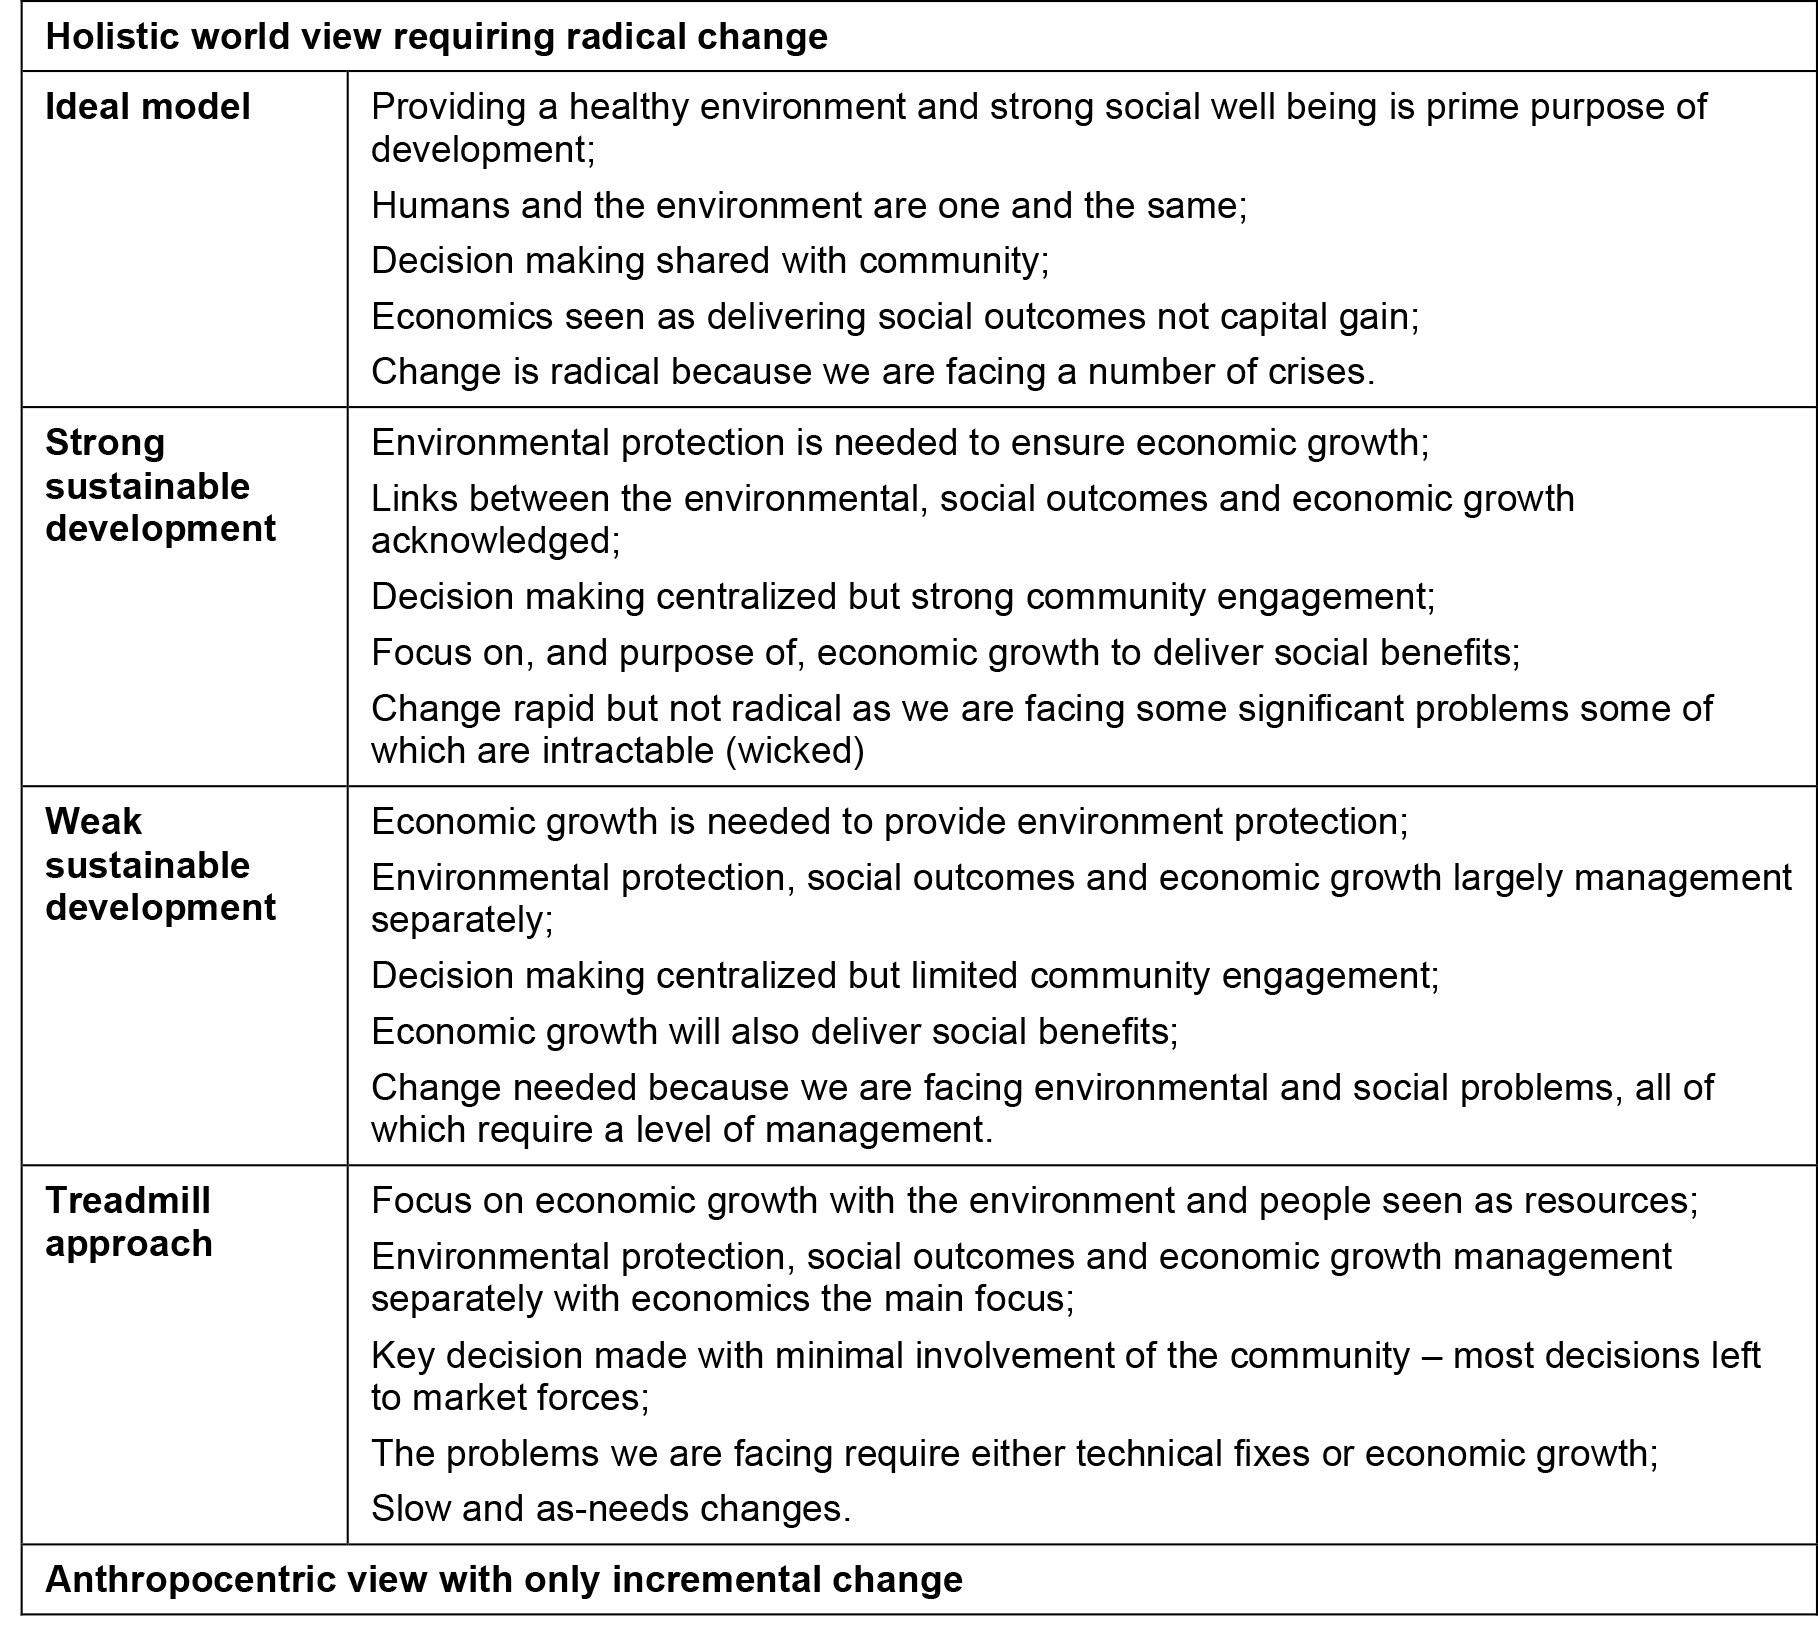 Table 1: A sustainable development spectrum (Adapted from Jones, Baker et al. 2005)